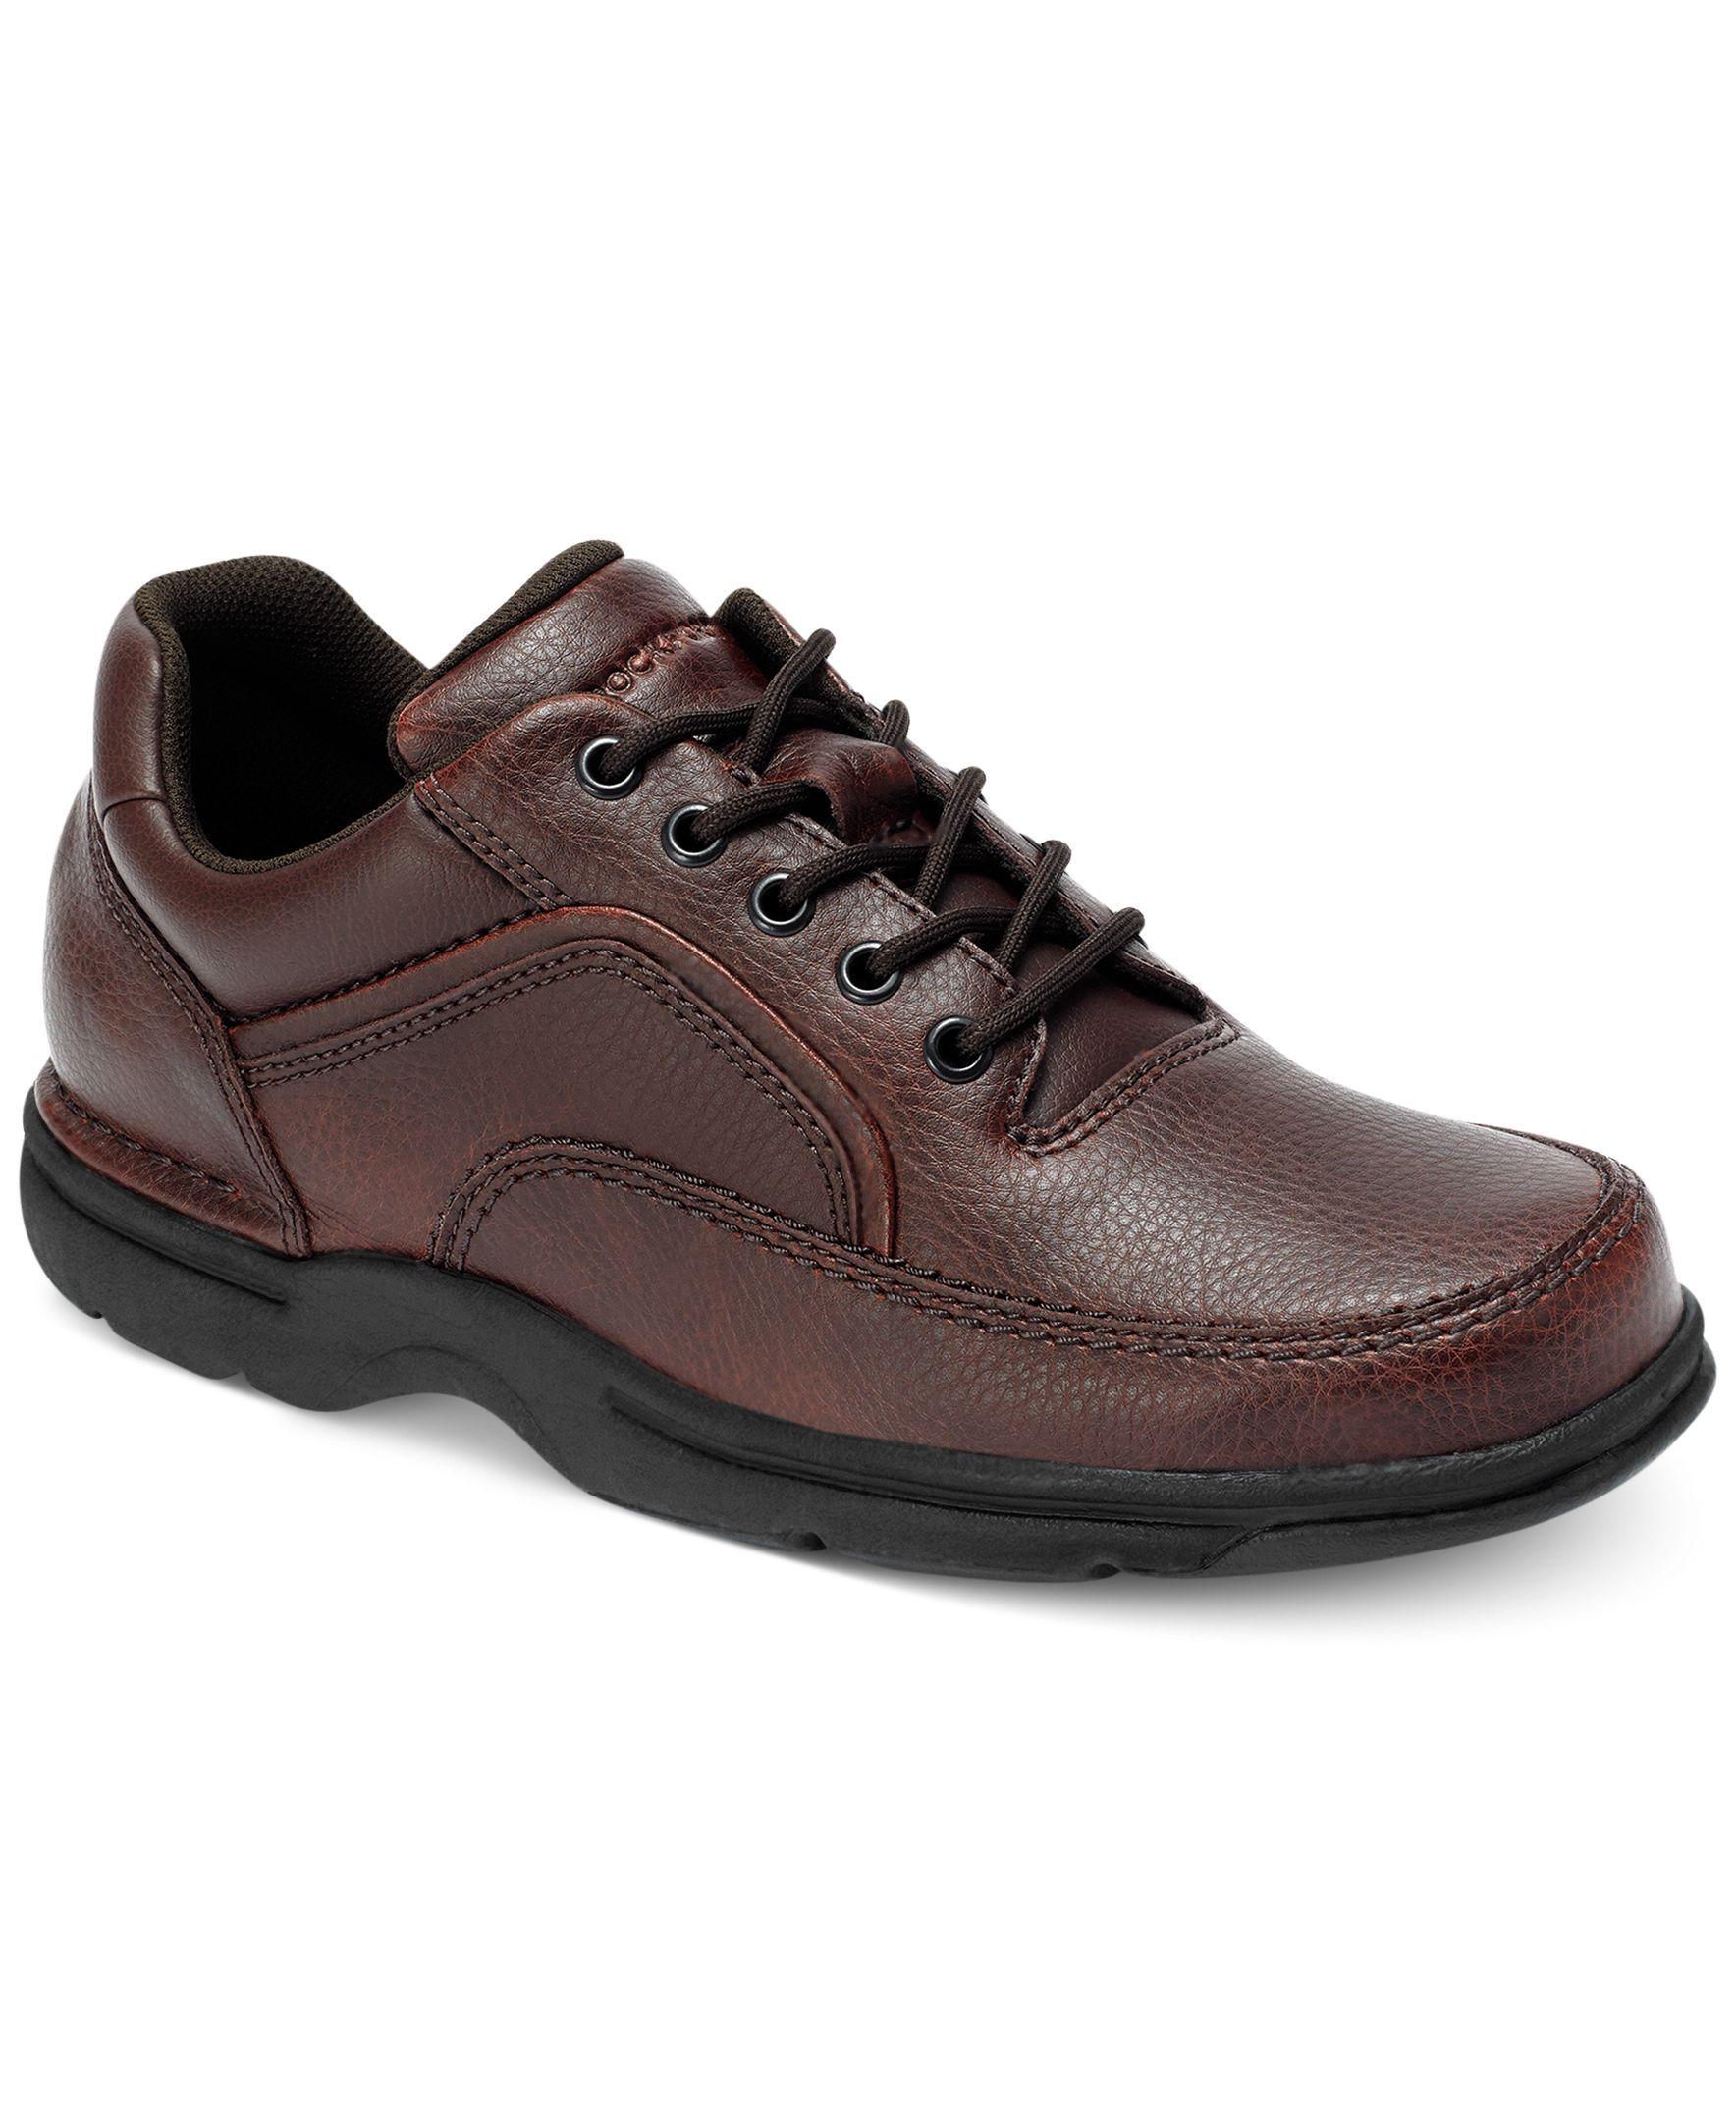 6e2453ed1ad Rockport Eureka Walking Shoe. Rockport Eureka Walking Shoe Zapatos De ...